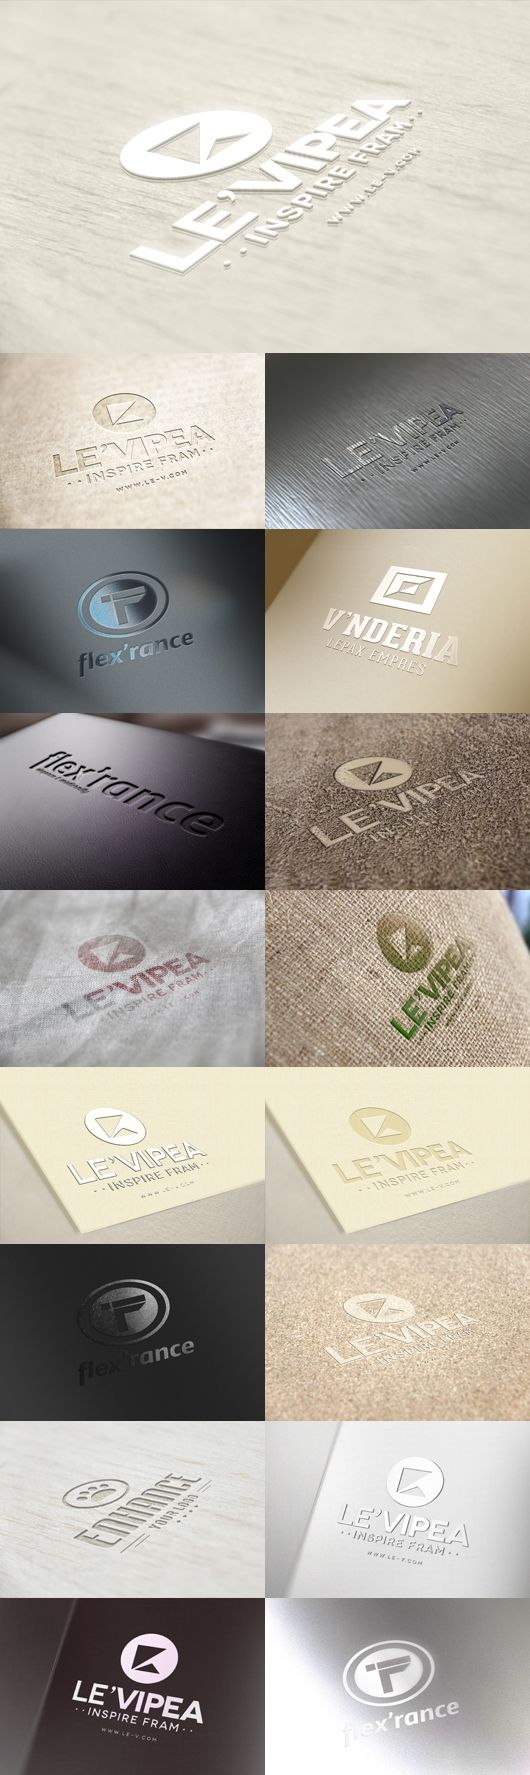 17 Logo Mockup Templates on Behance